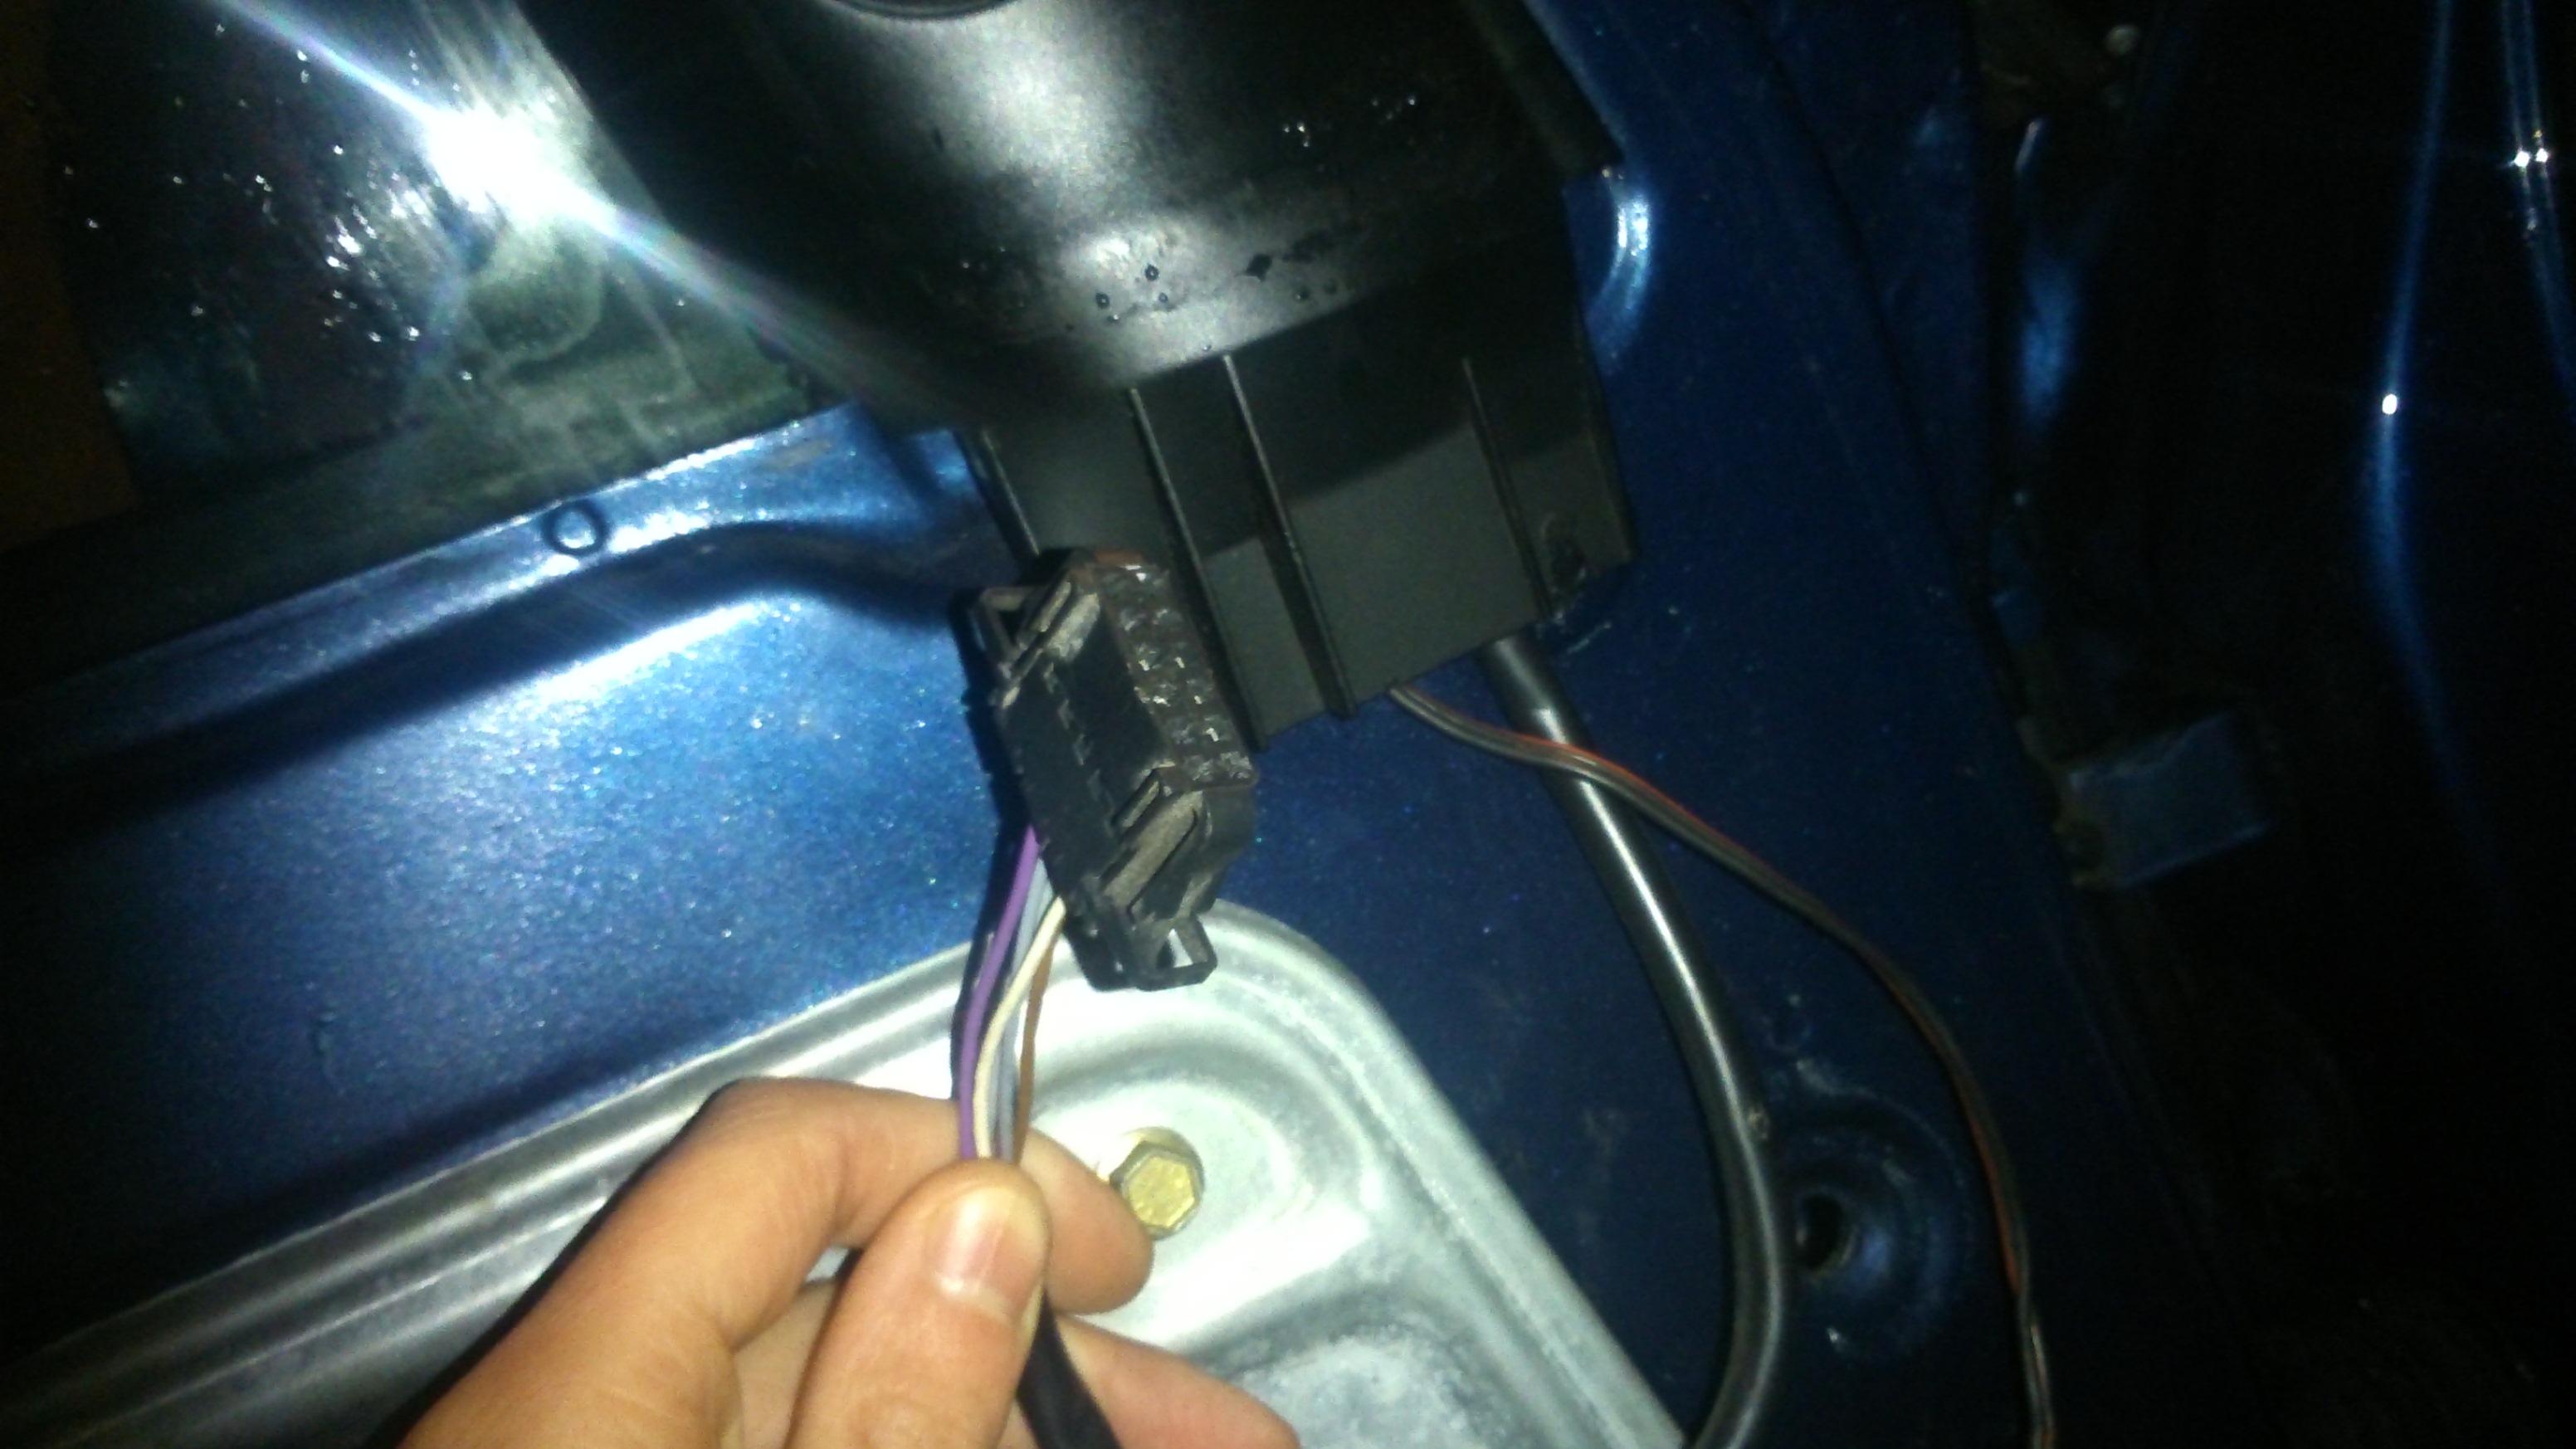 Passat b5 97r brak el lusterek podgrzewanie kable w for 01331 door control module driver side j386